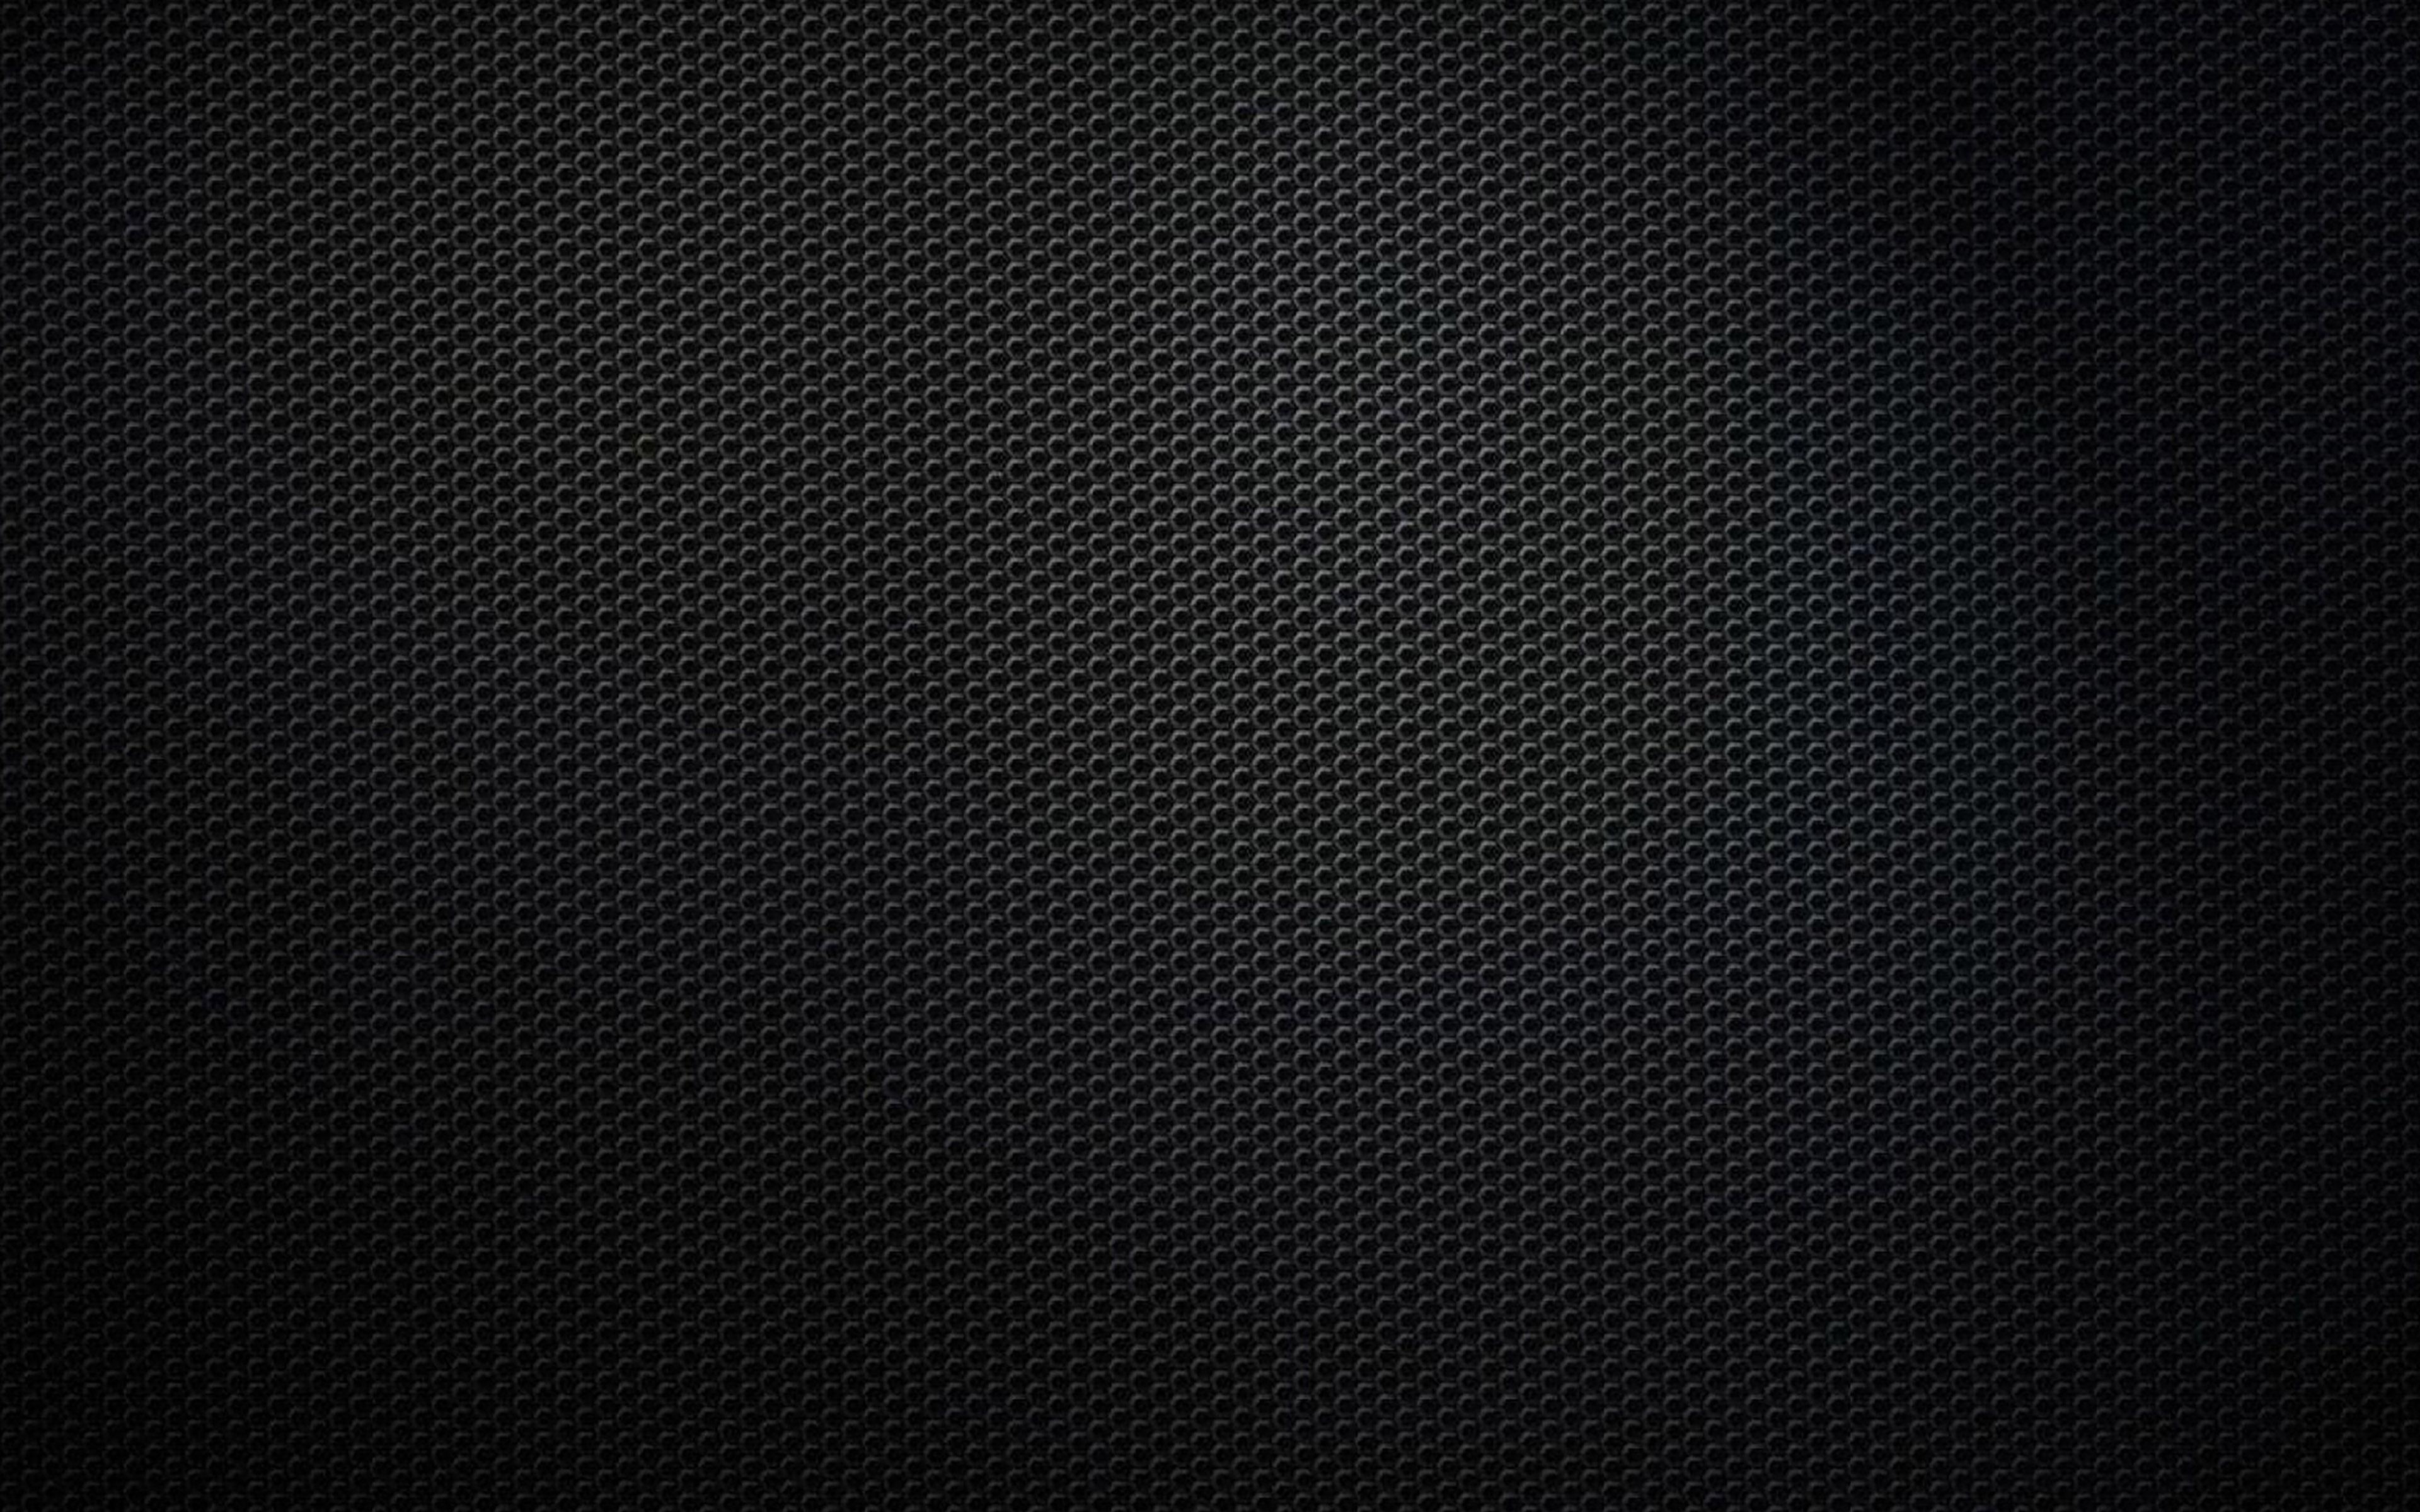 va43-carbon-pattern-black-pattern